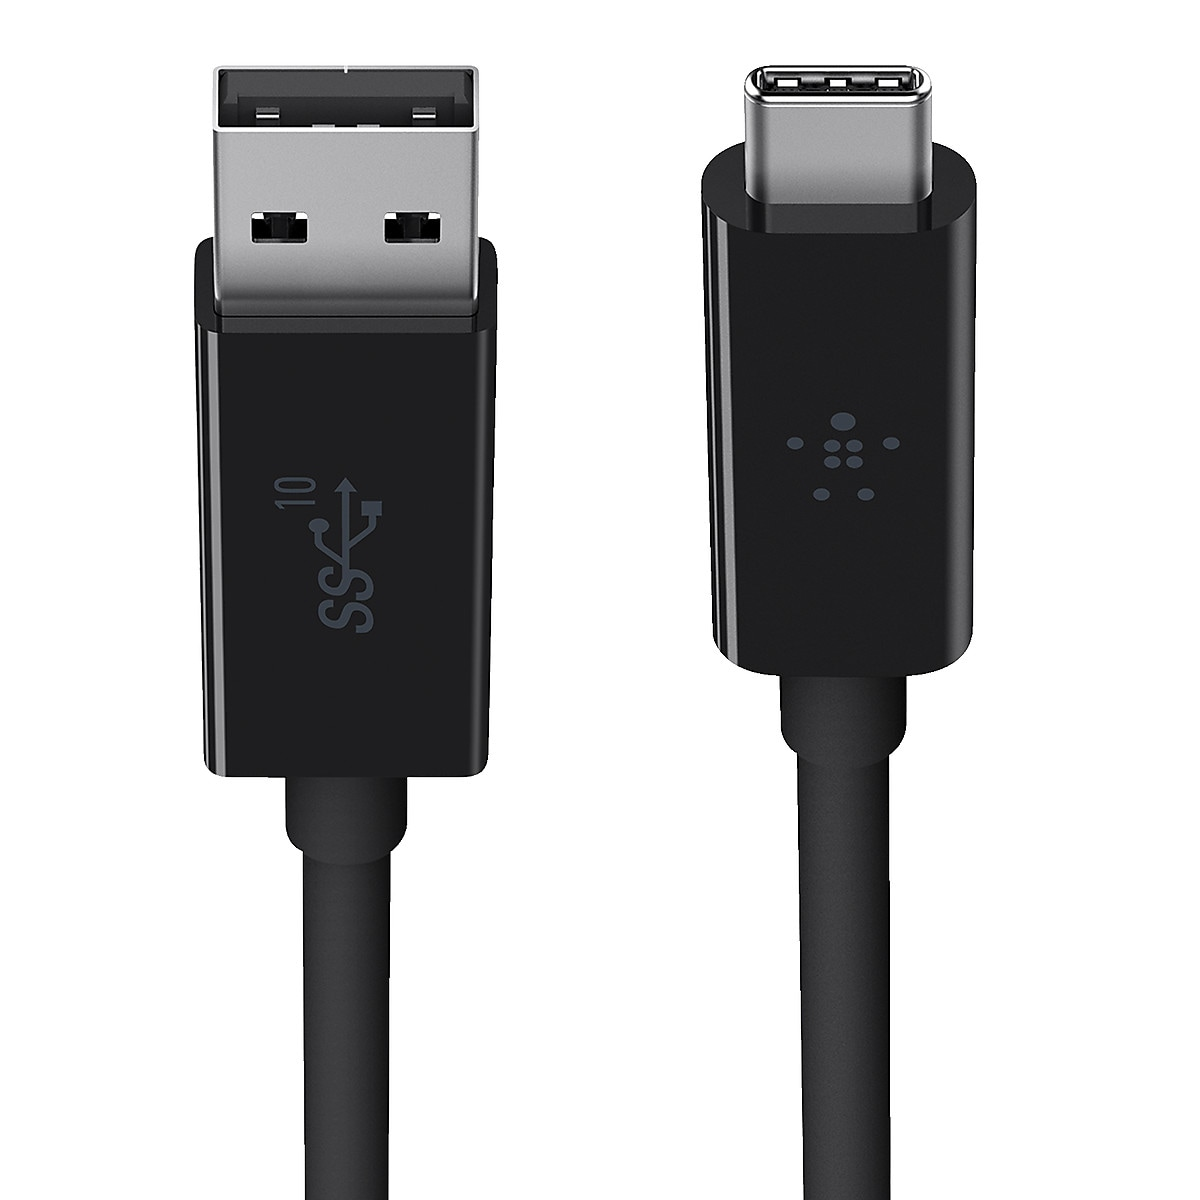 USB-Kabel USB-C auf USB-A (USB 3.1) Belkin